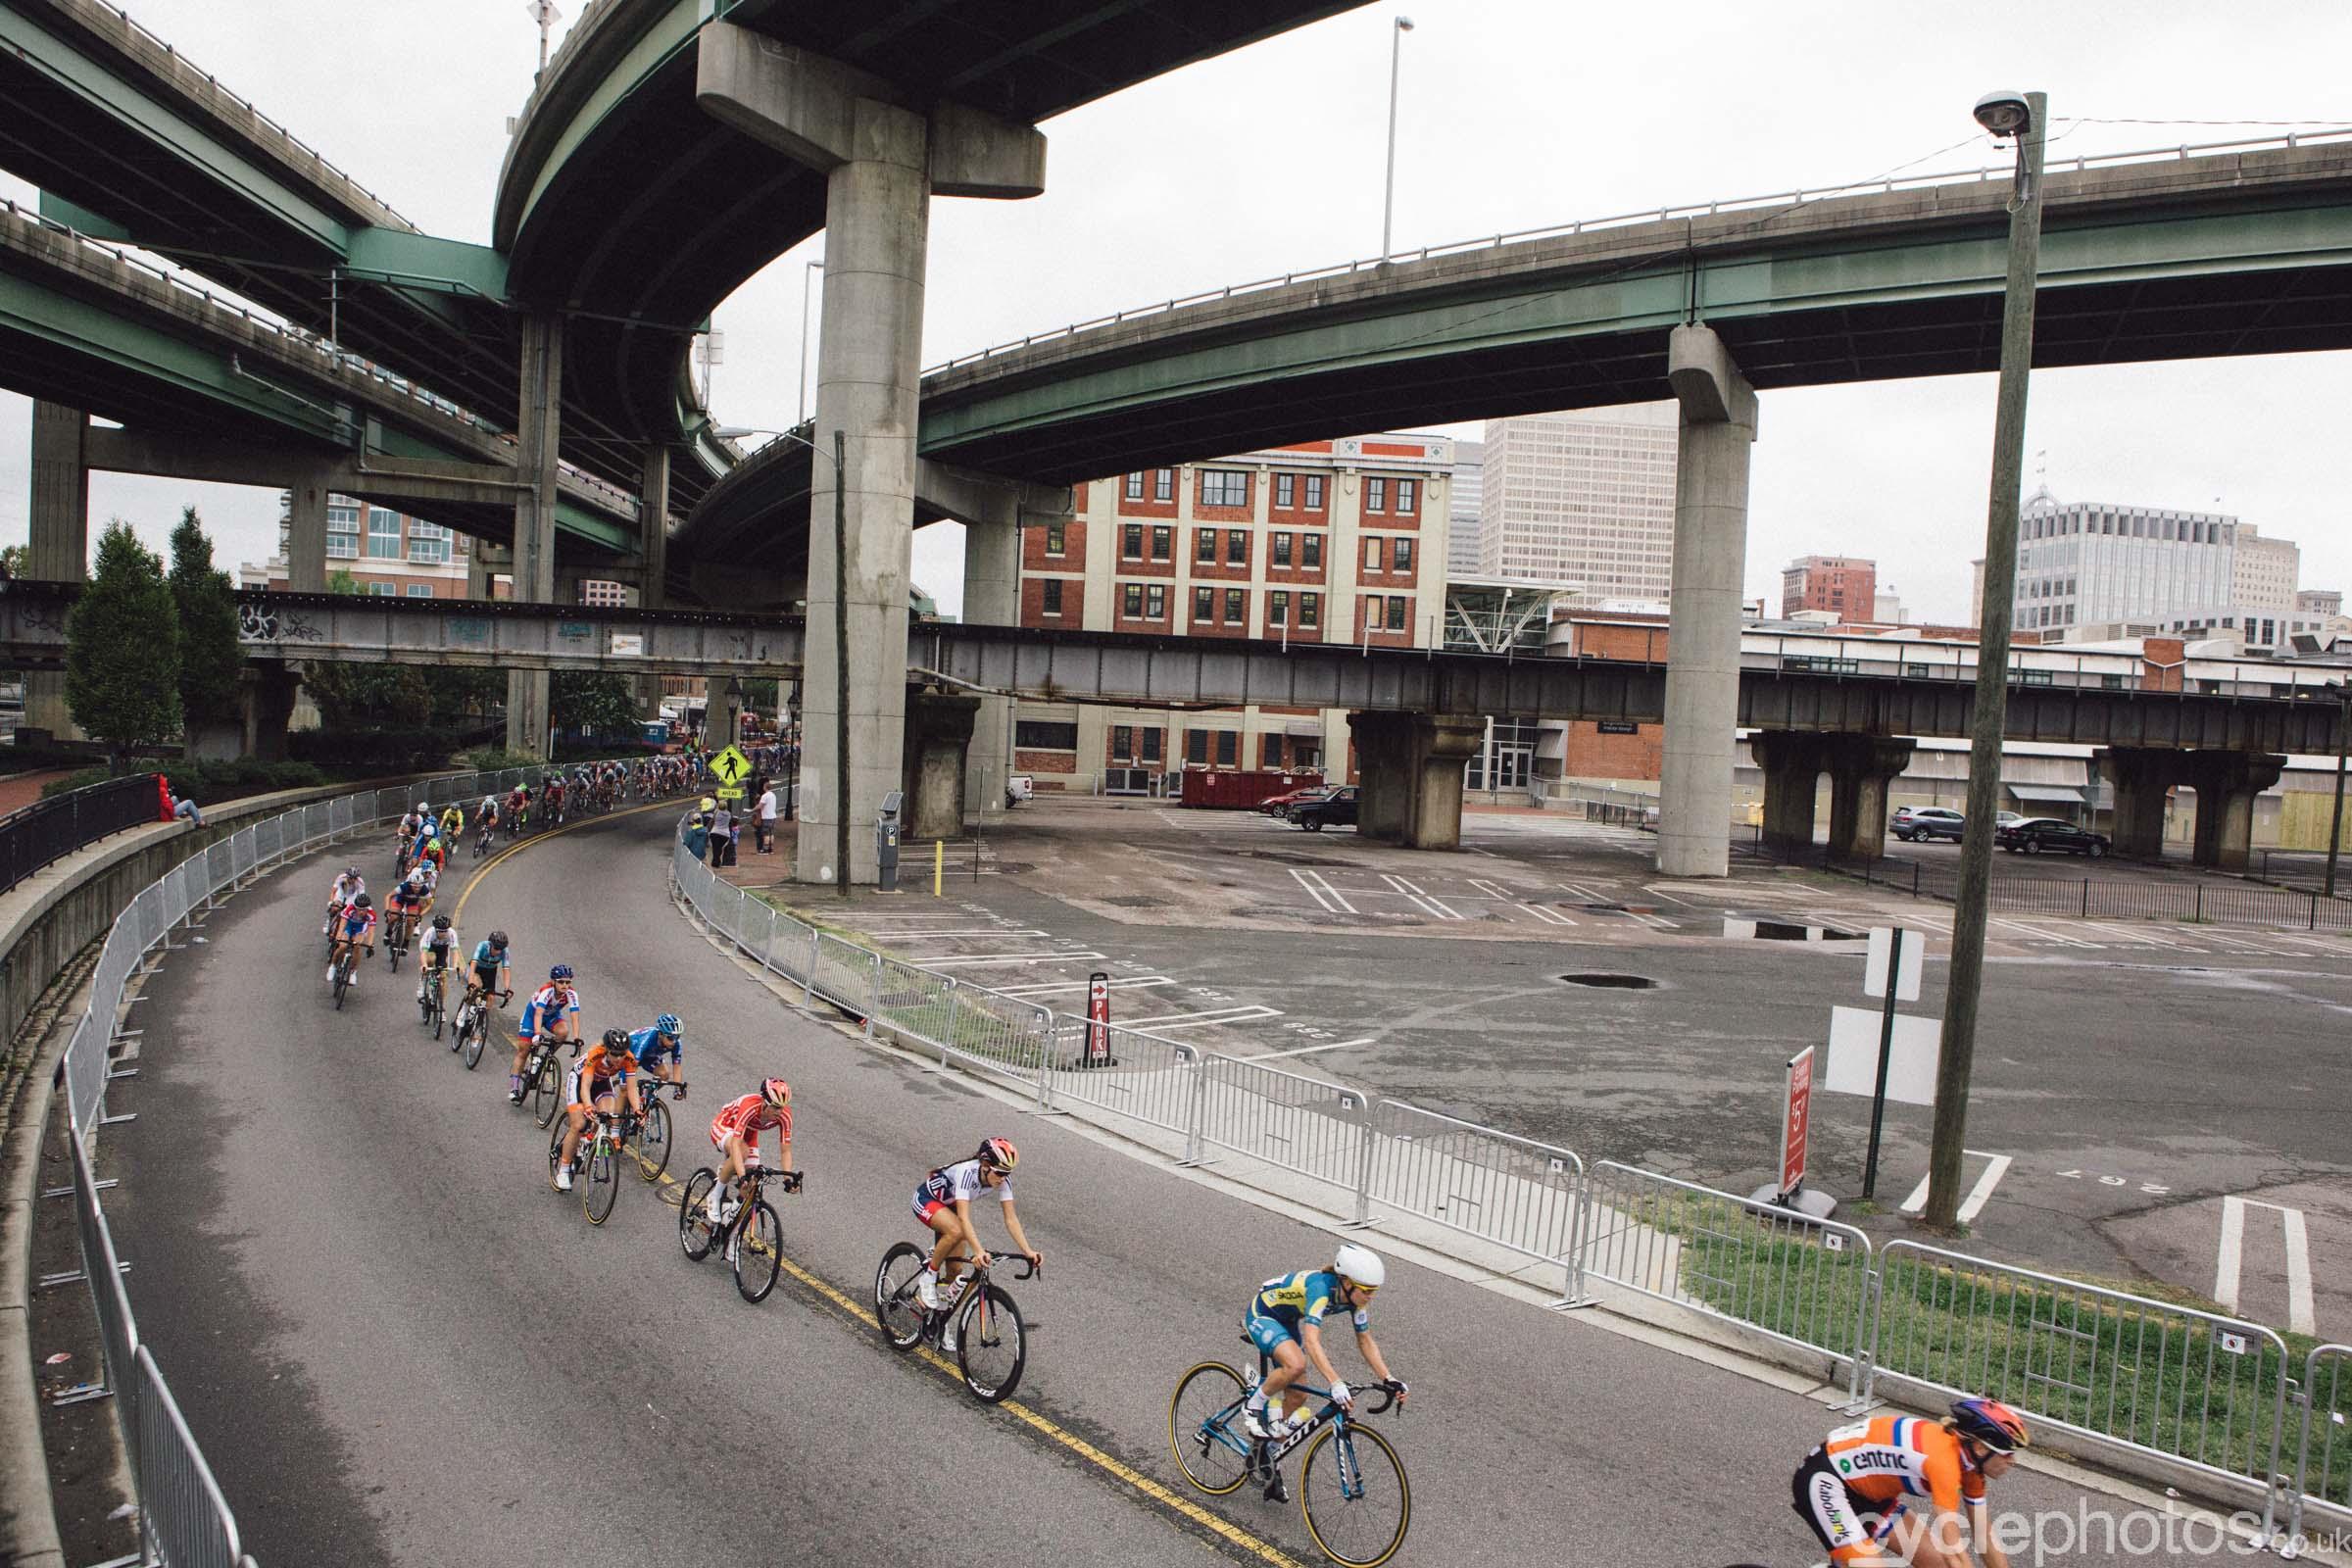 cyclephotos-world-champs-richmond-133825